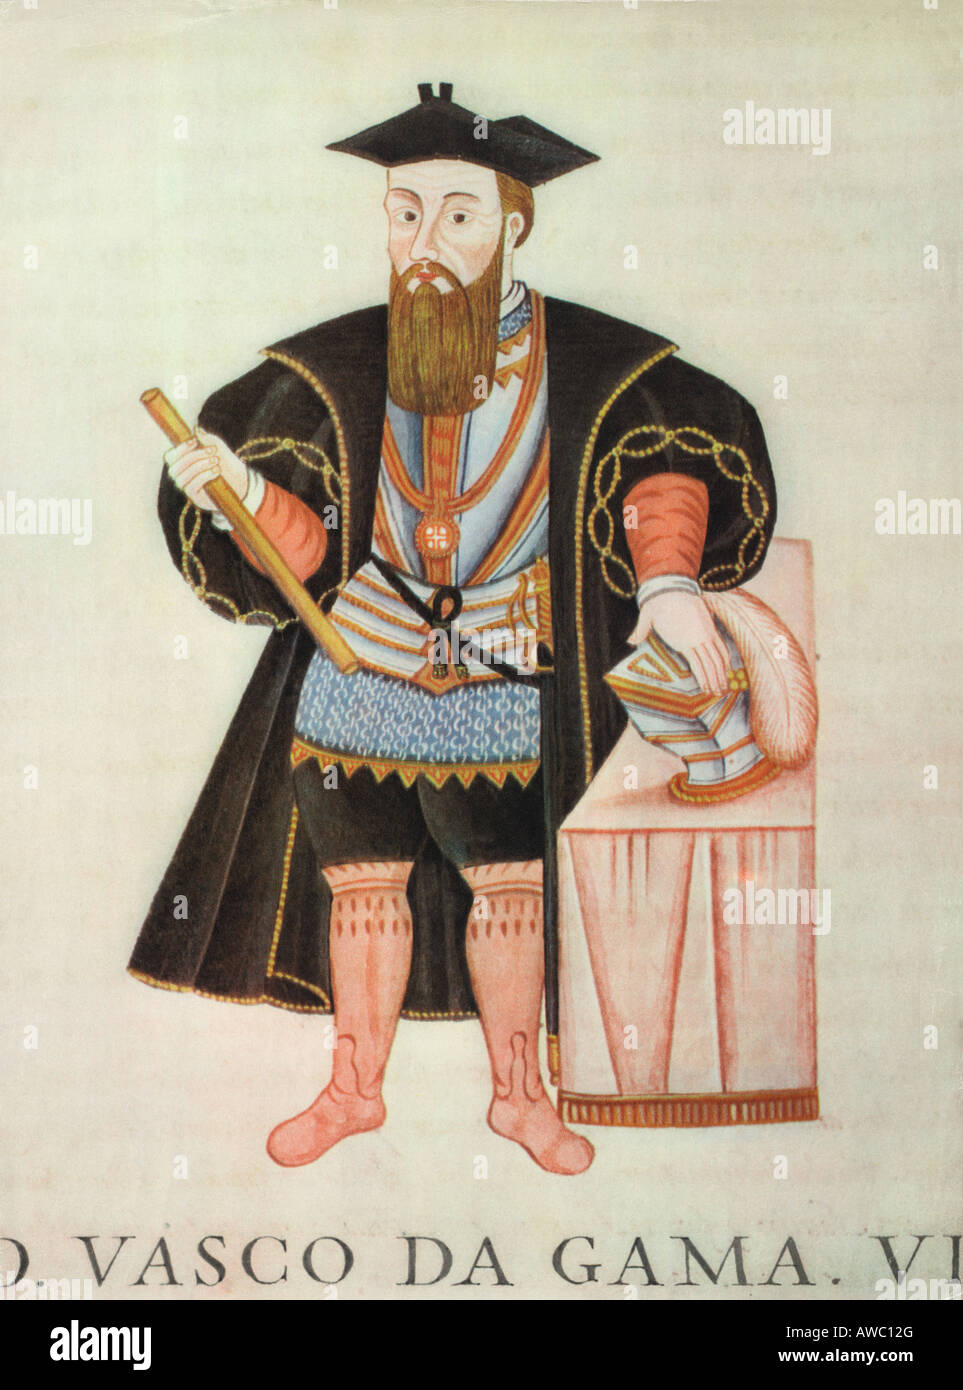 Vasco da Gama 1469 1524 a Portuguese navigator. - Stock Image